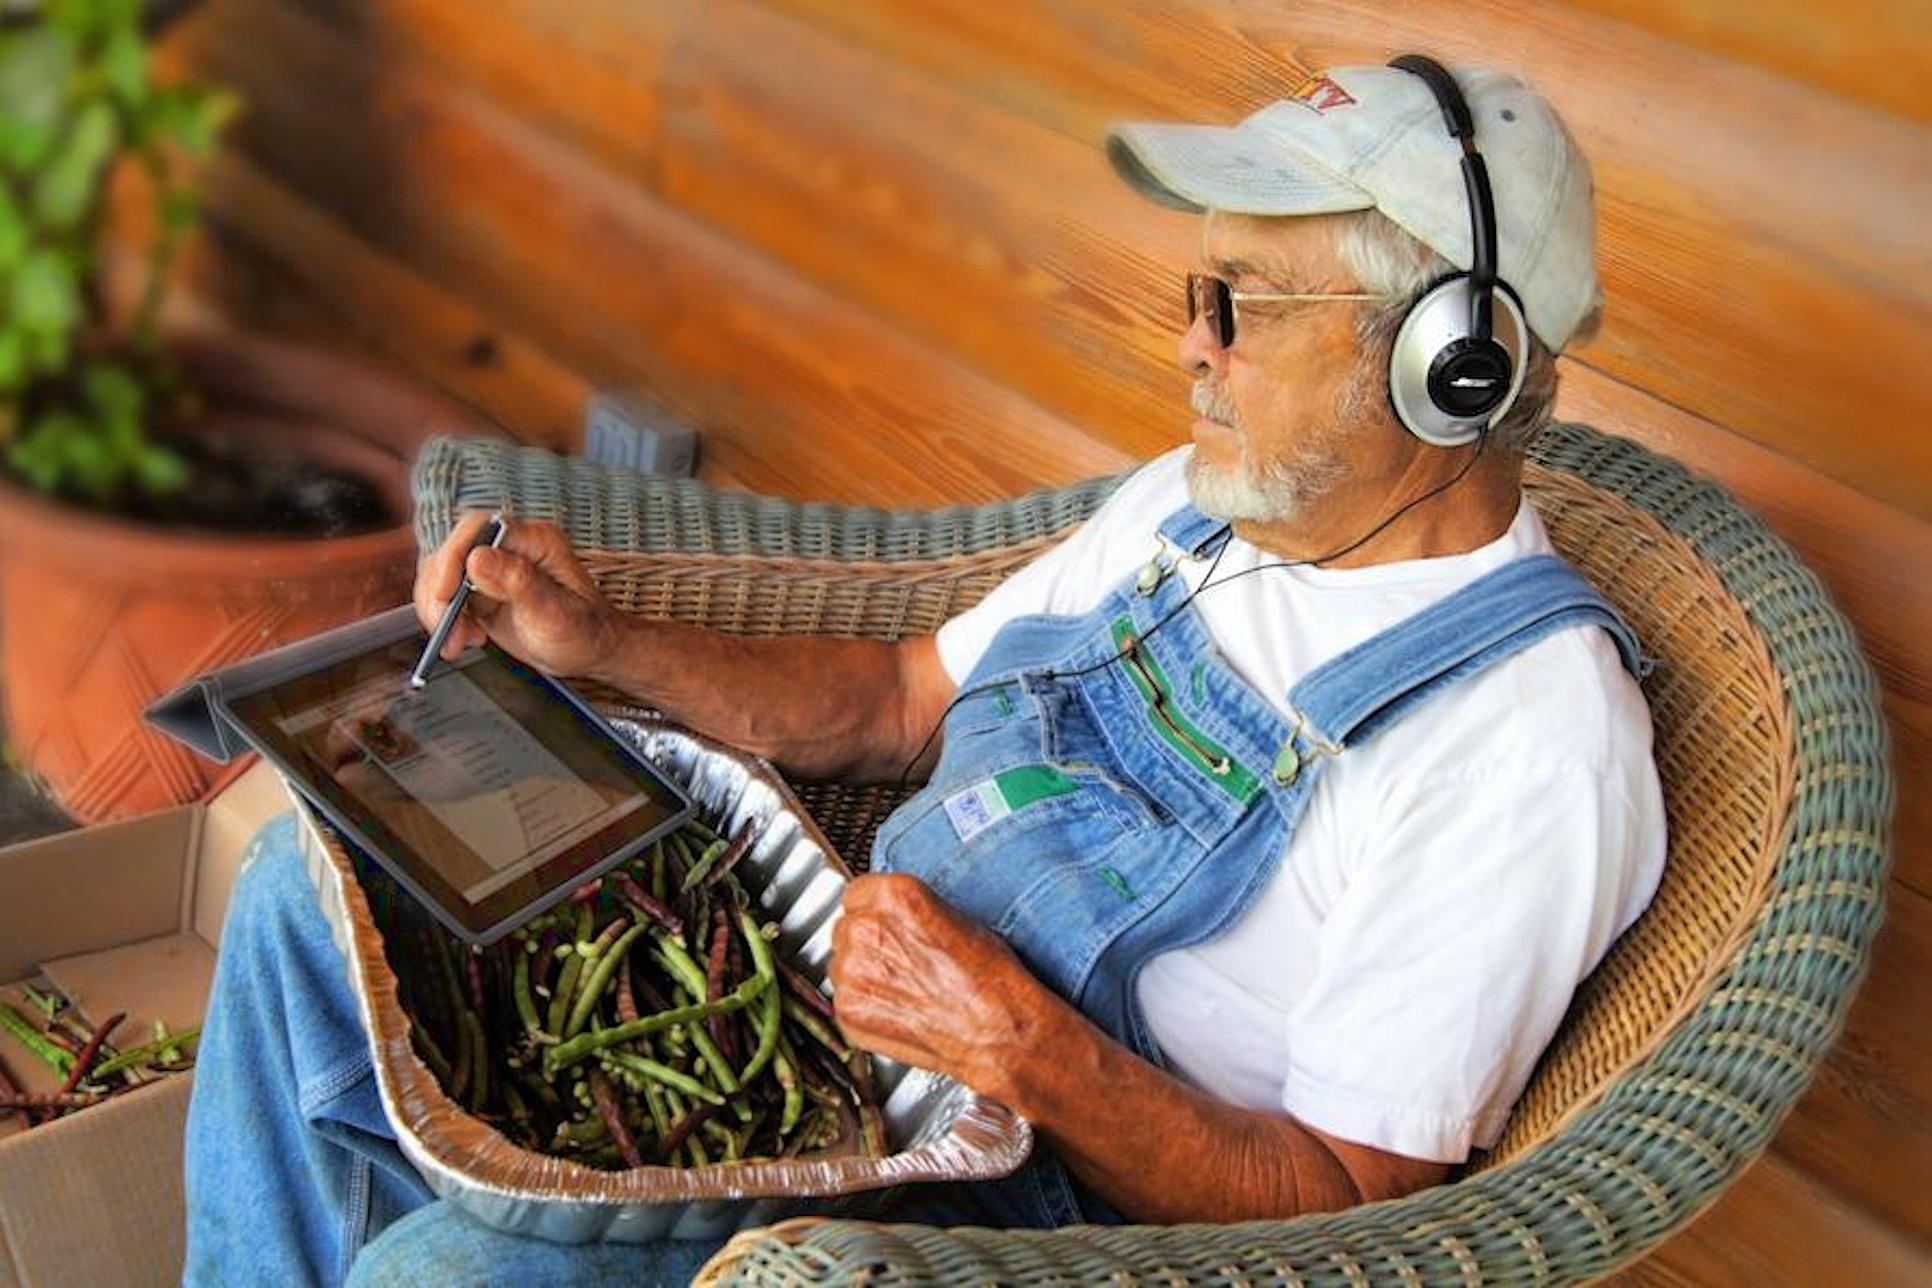 Starý farmář s iPadem